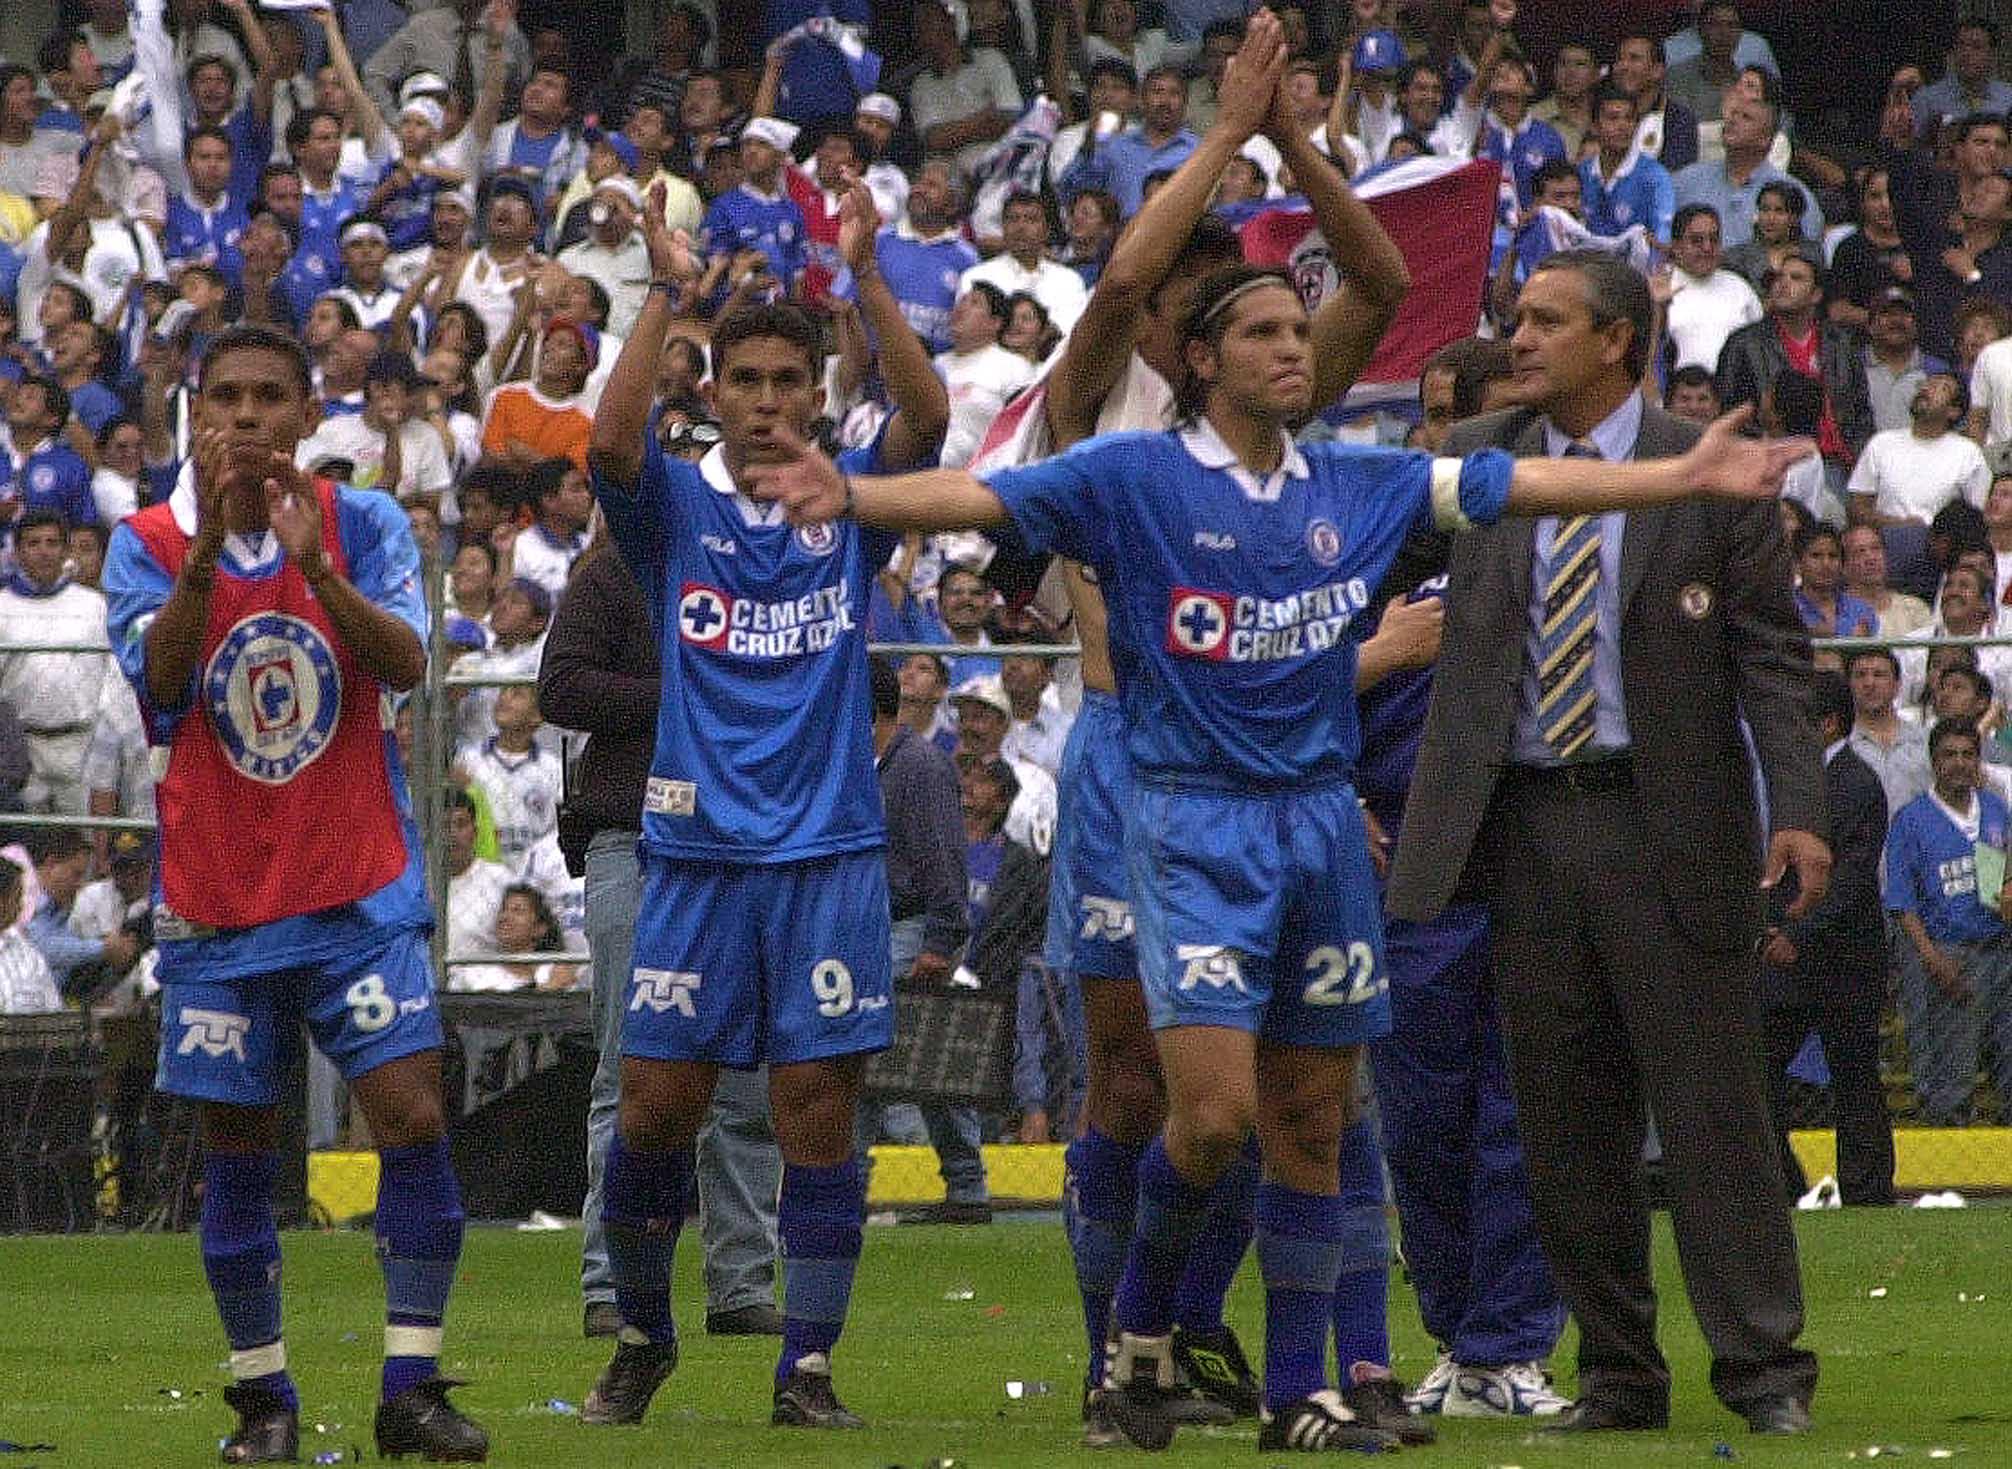 Cruz Azul llegó a la final de la edición 2001 de la Libertadores, pero perdió ante Boca Juniors (Foto: Christian Palma/ Cuartoscuro)